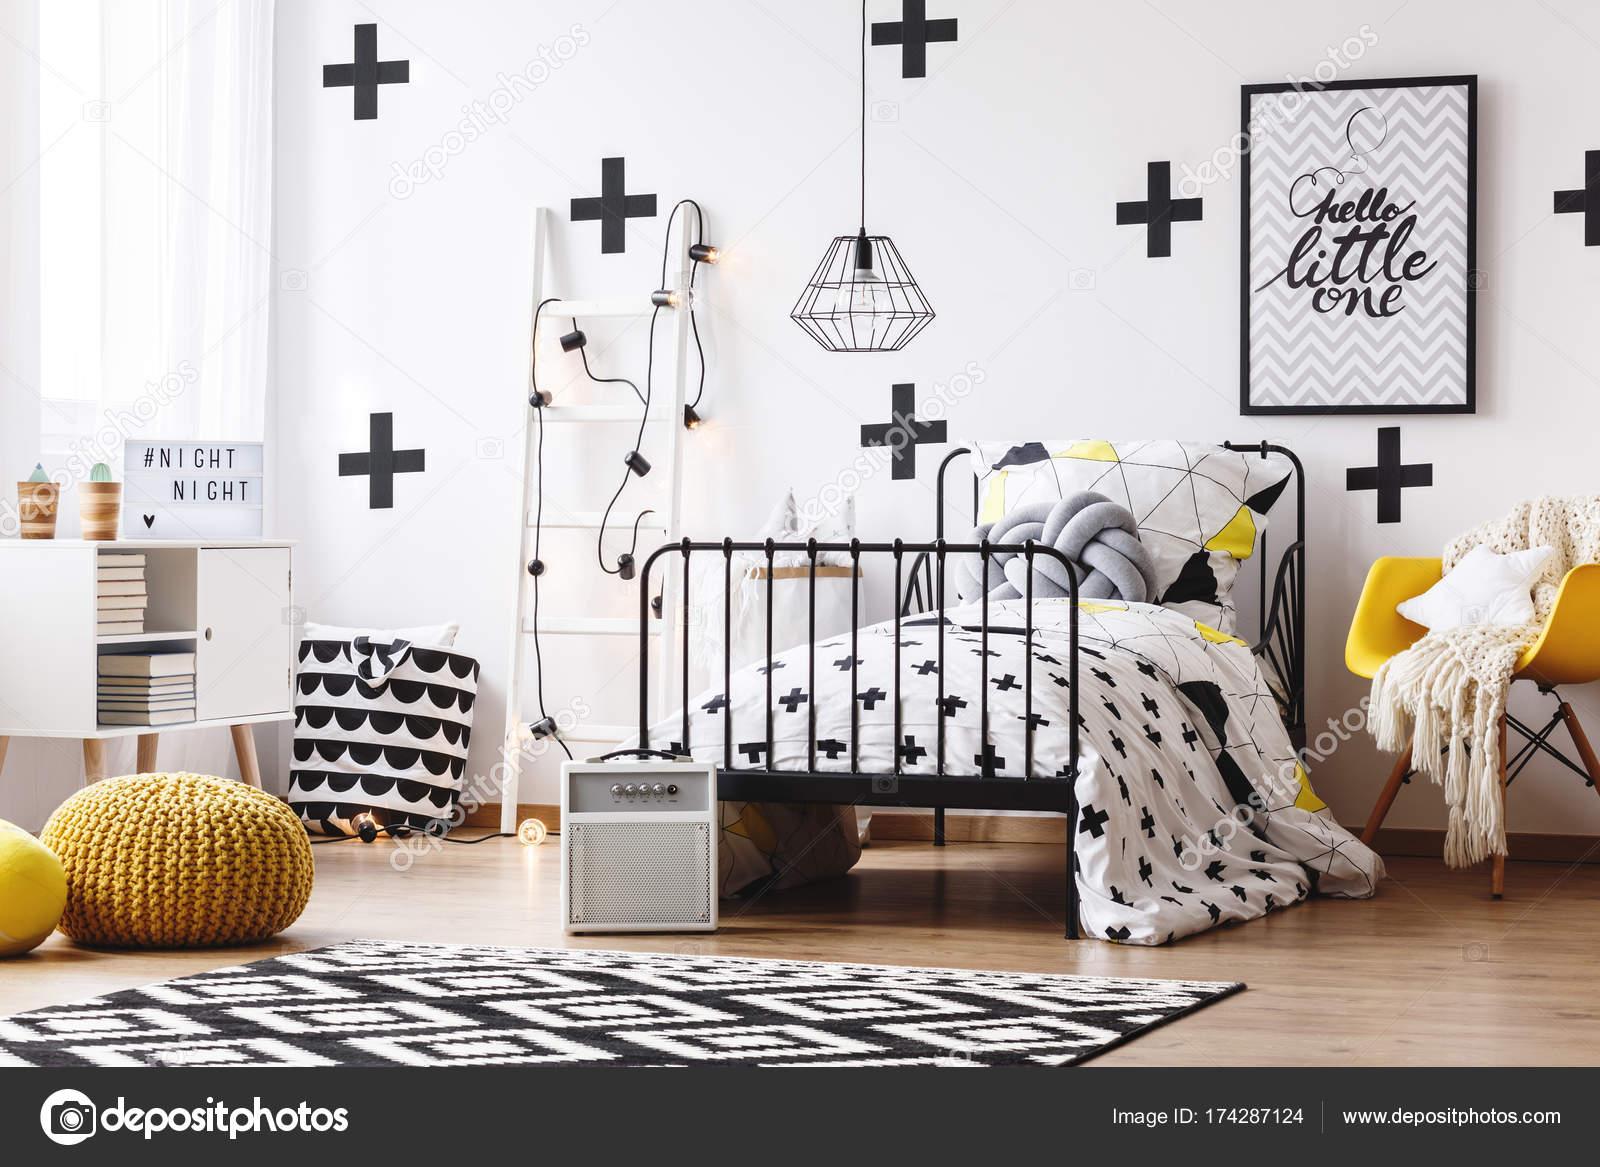 https://st3.depositphotos.com/2249091/17428/i/1600/depositphotos_174287124-stockafbeelding-wallpaper-met-kruisen-in-slaapkamer.jpg